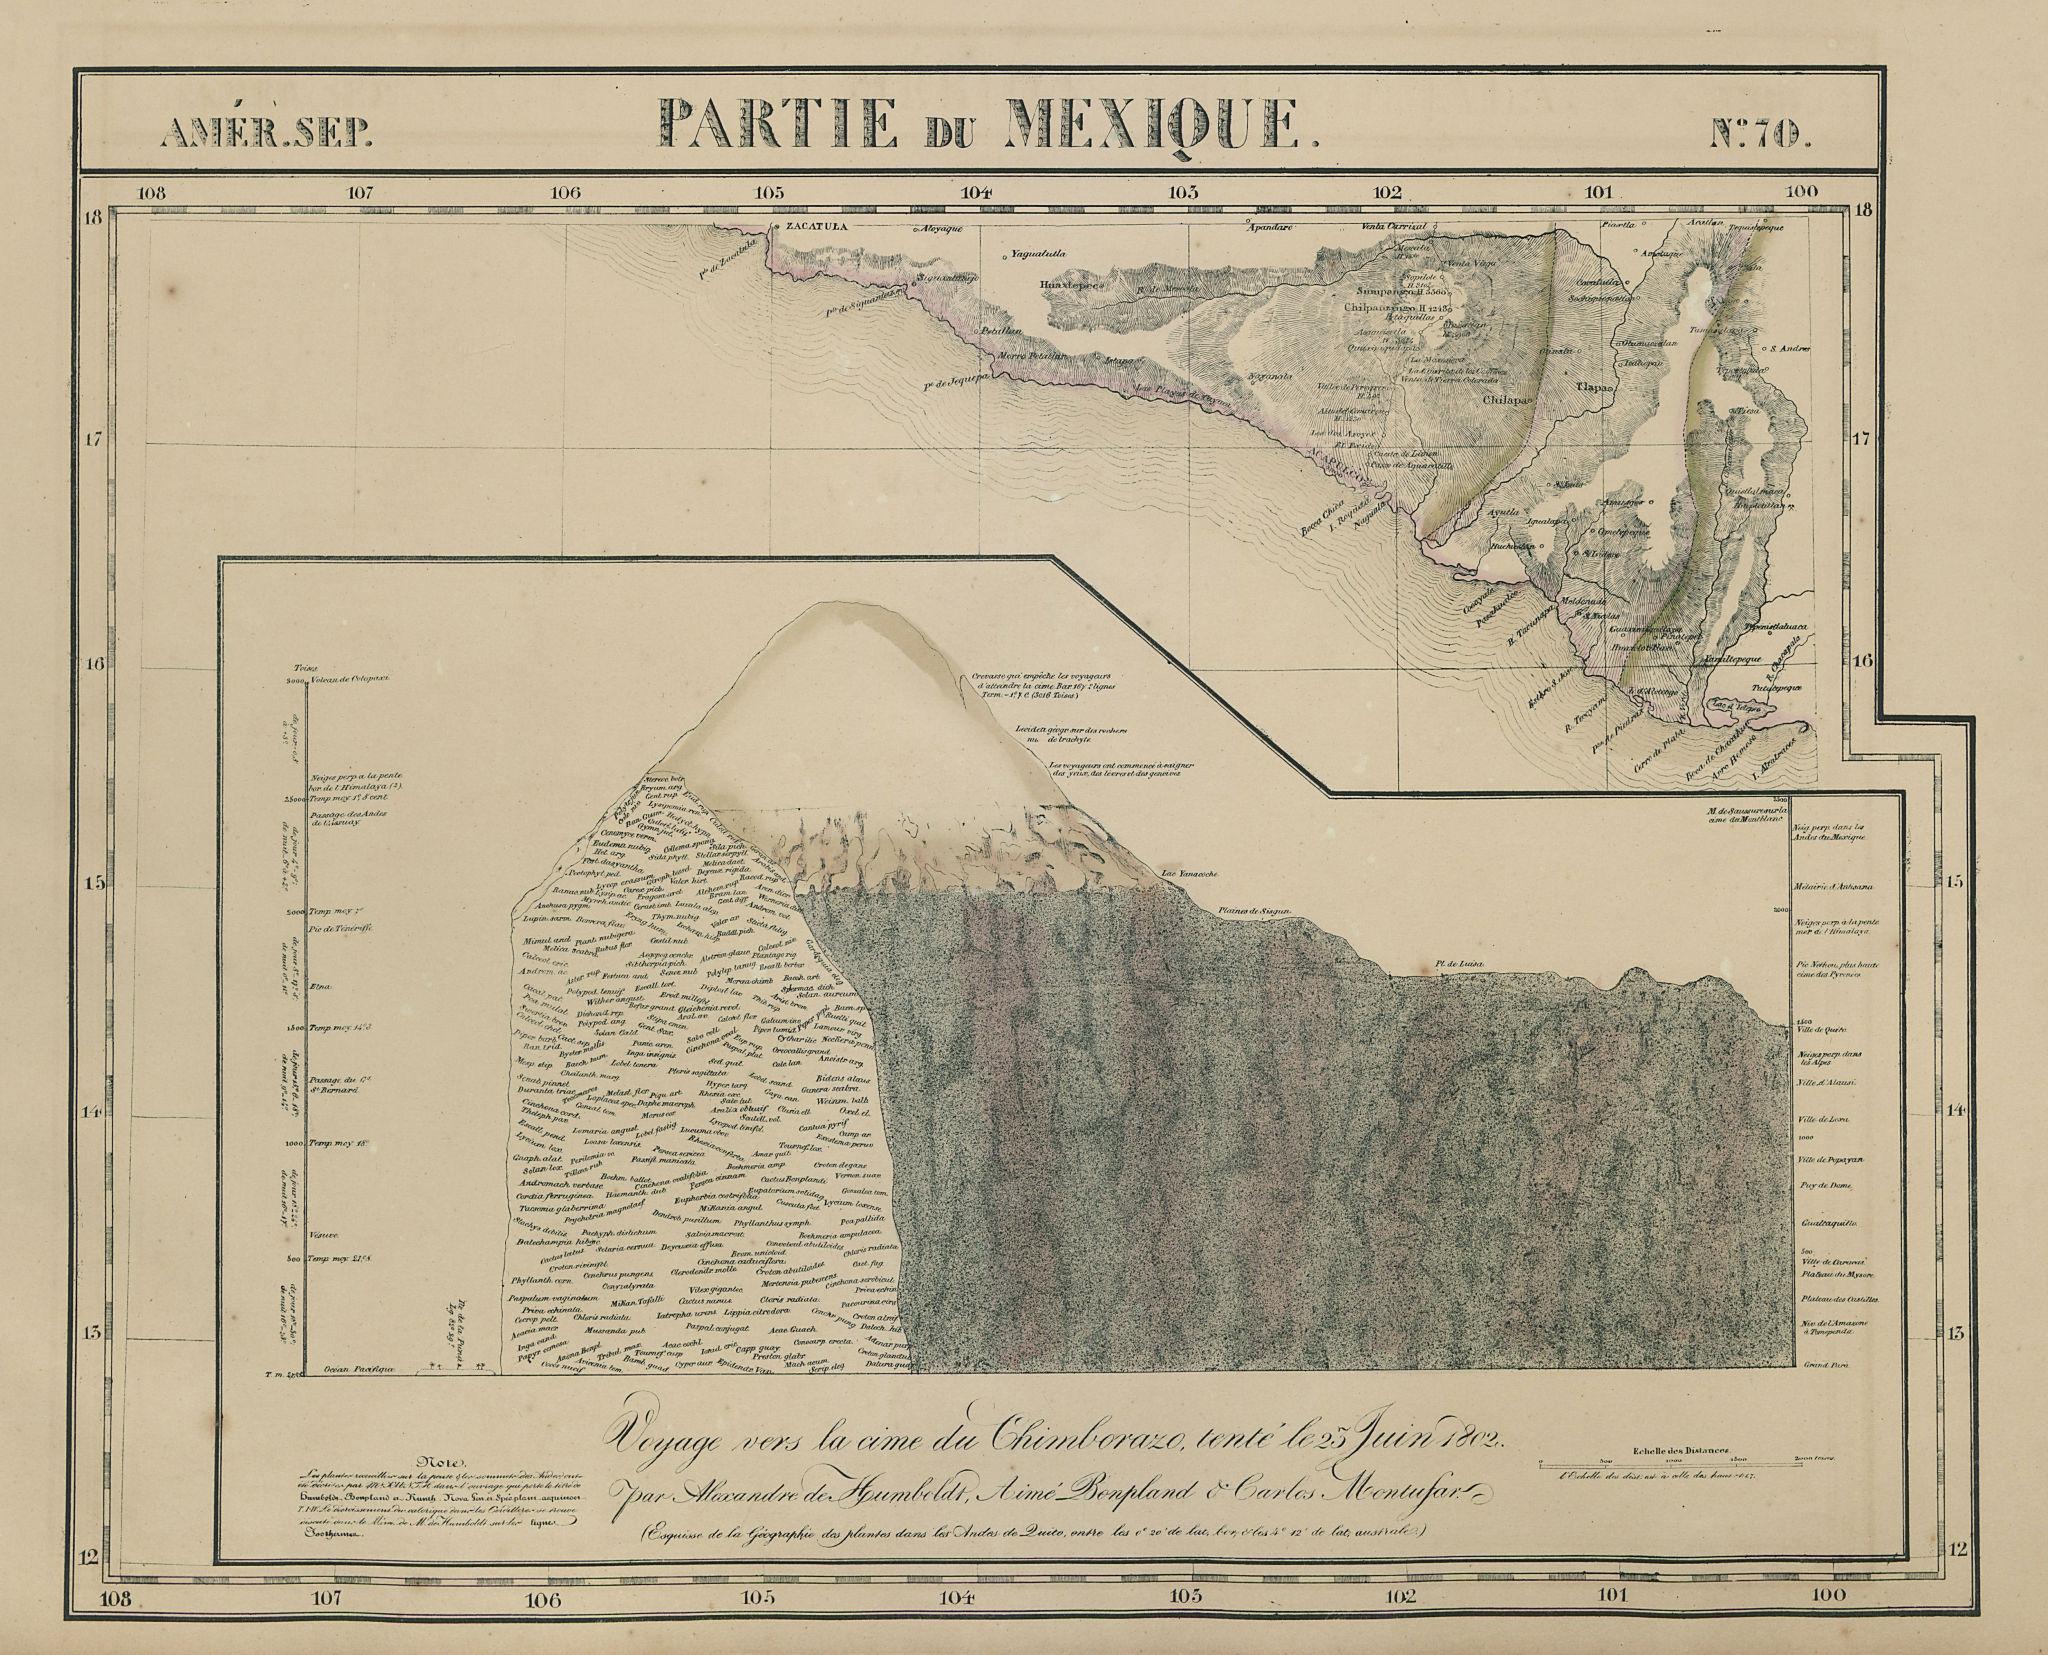 Amér Sep. Partie du Mexique #70 Acapulco Mexico Chimborazo VANDERMAELEN 1827 map